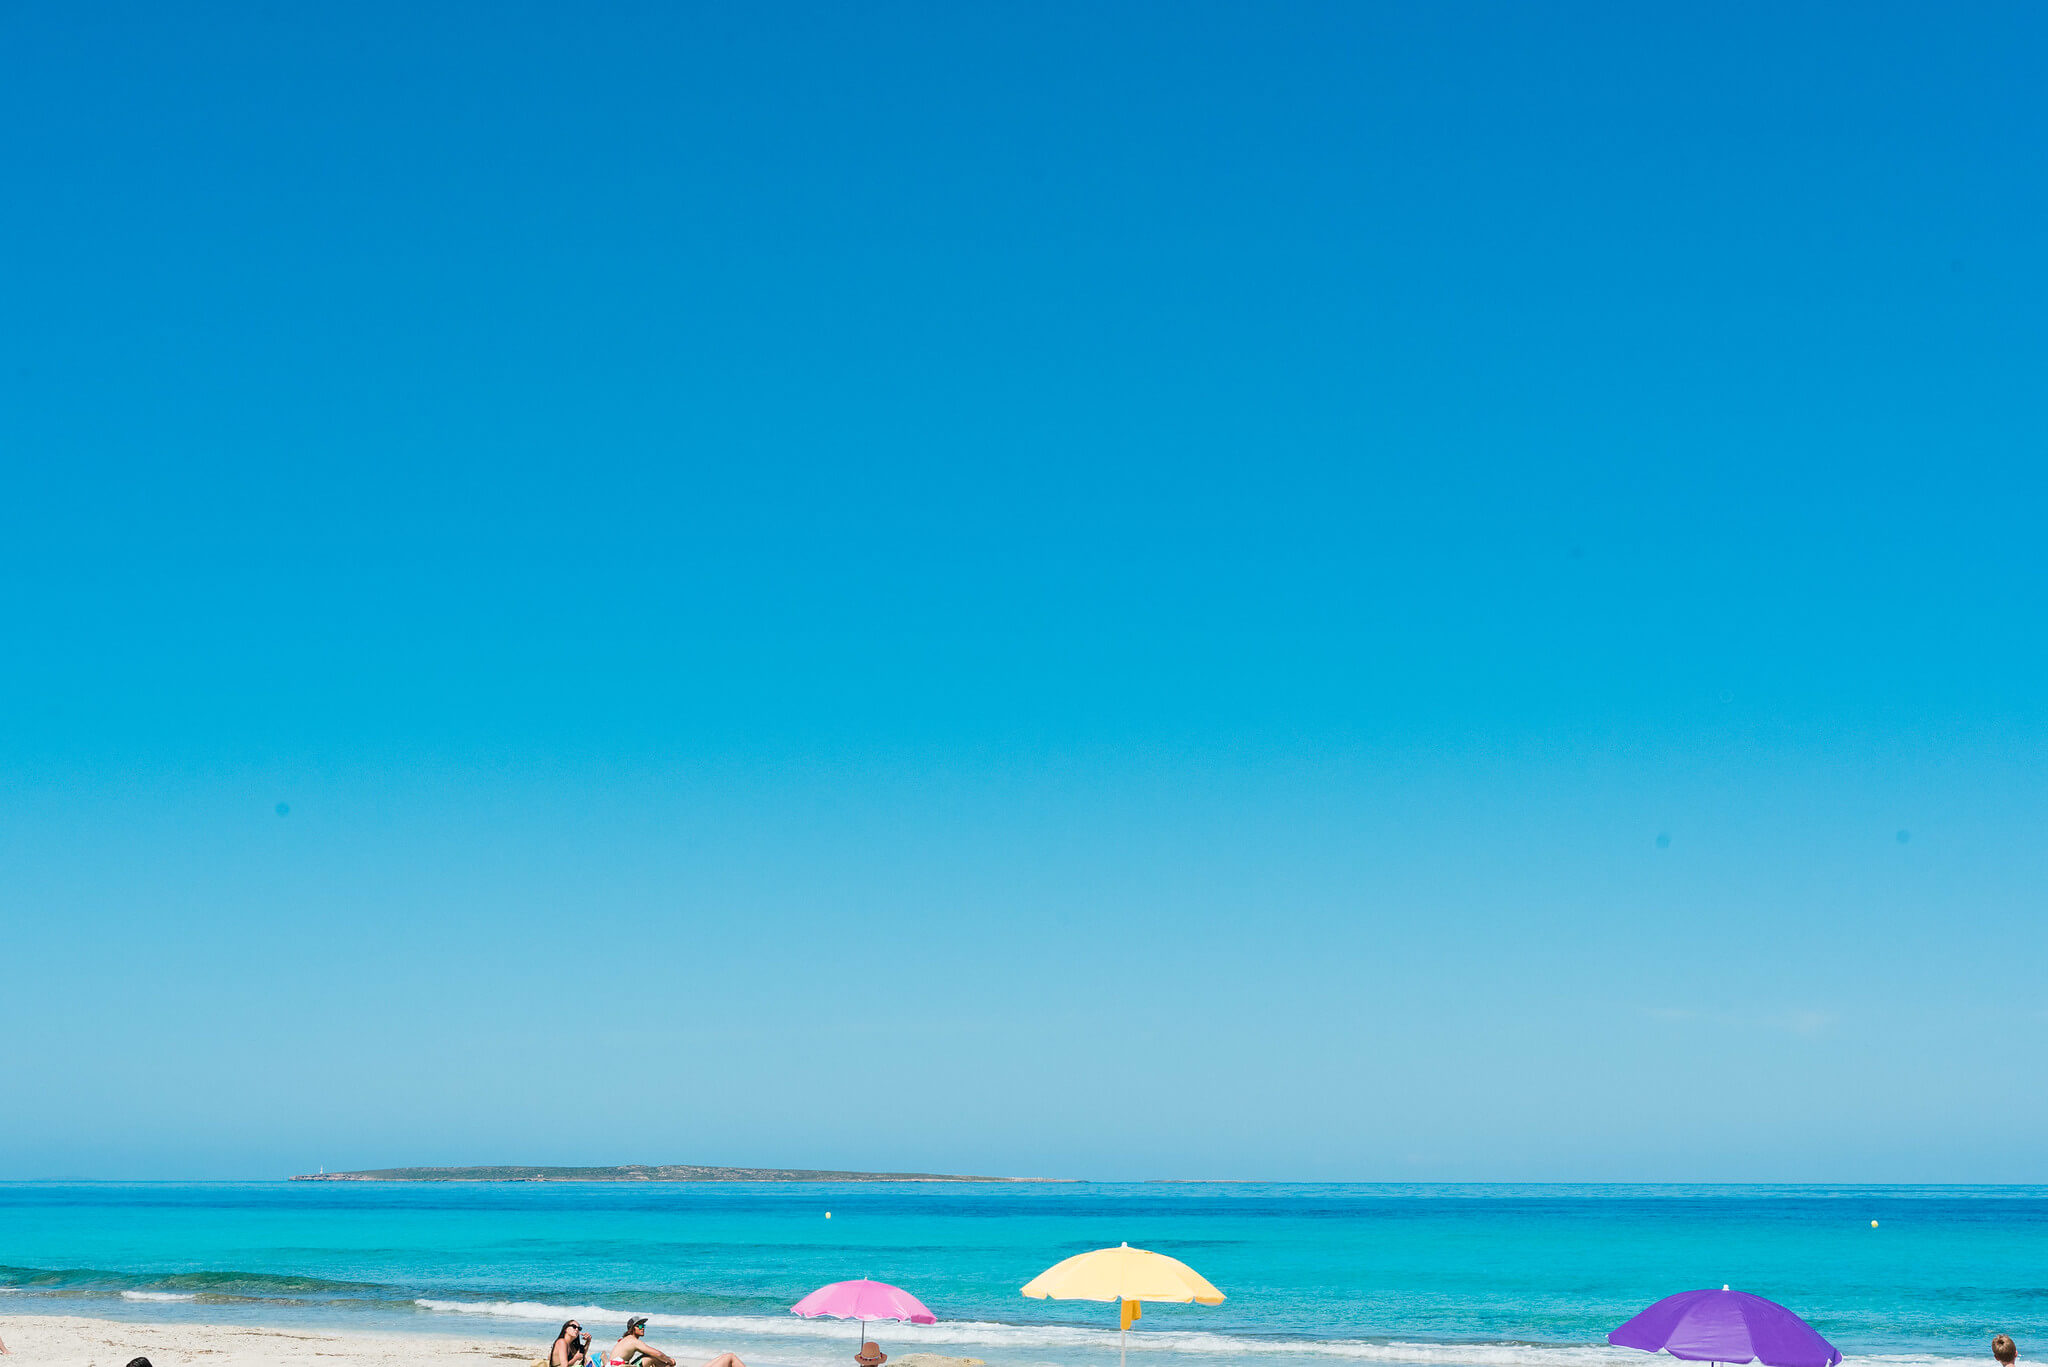 https://www.white-ibiza.com/wp-content/uploads/2020/04/formentera-beaches-illetes-2020-05.jpg